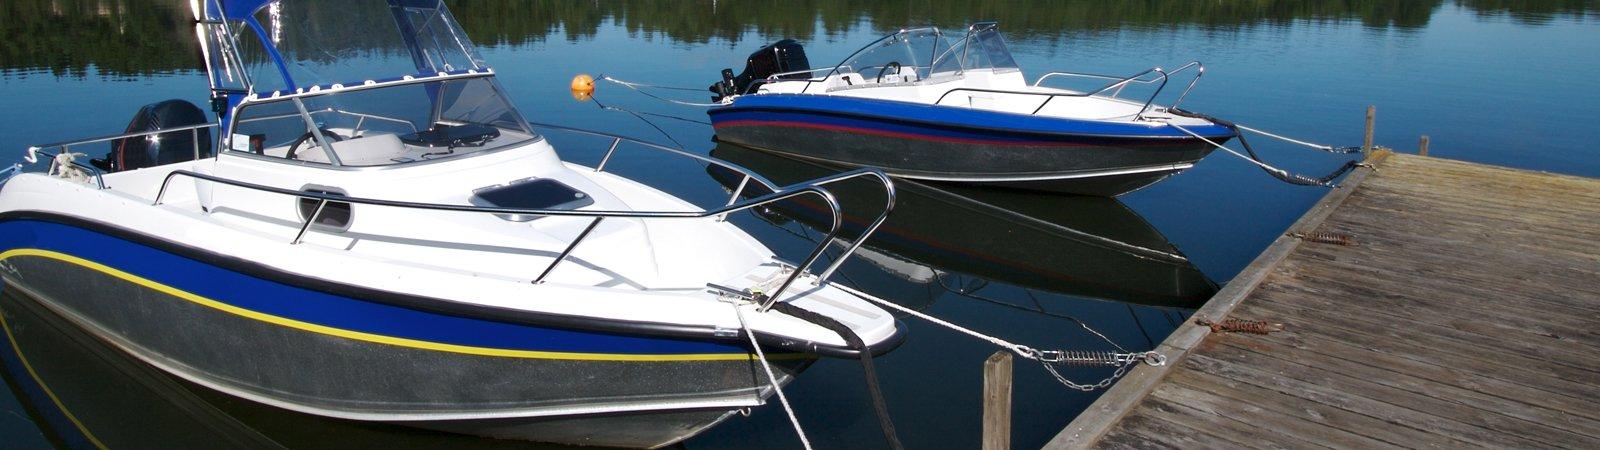 Boat & Marine Battery Adelaide